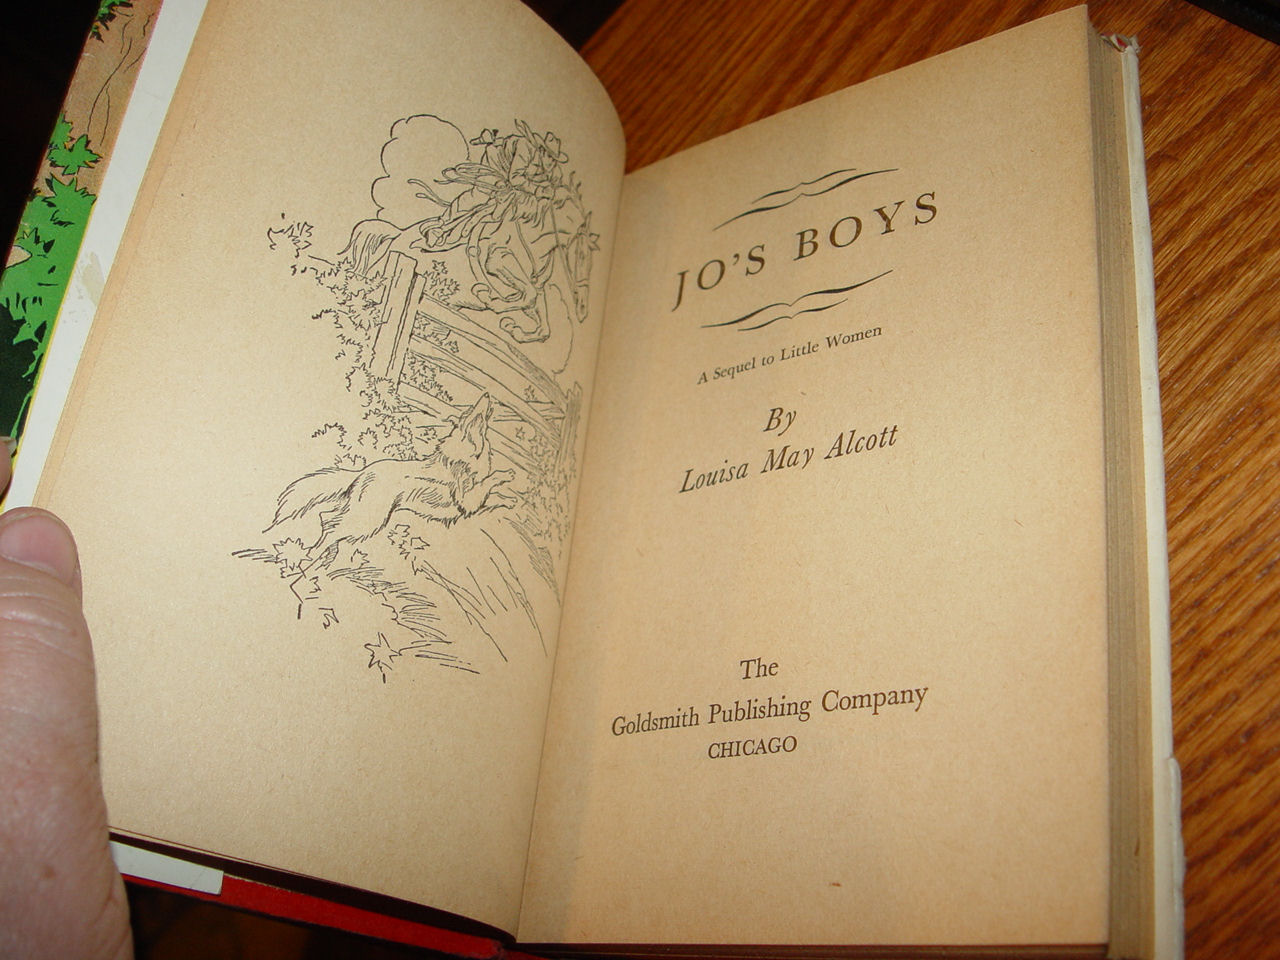 JO'S BOYS ALCOTT,                                         LOUISA MAY Published by THE                                         GOLDSMITH PUBLISHING COMPANY,                                         ILLINOIS